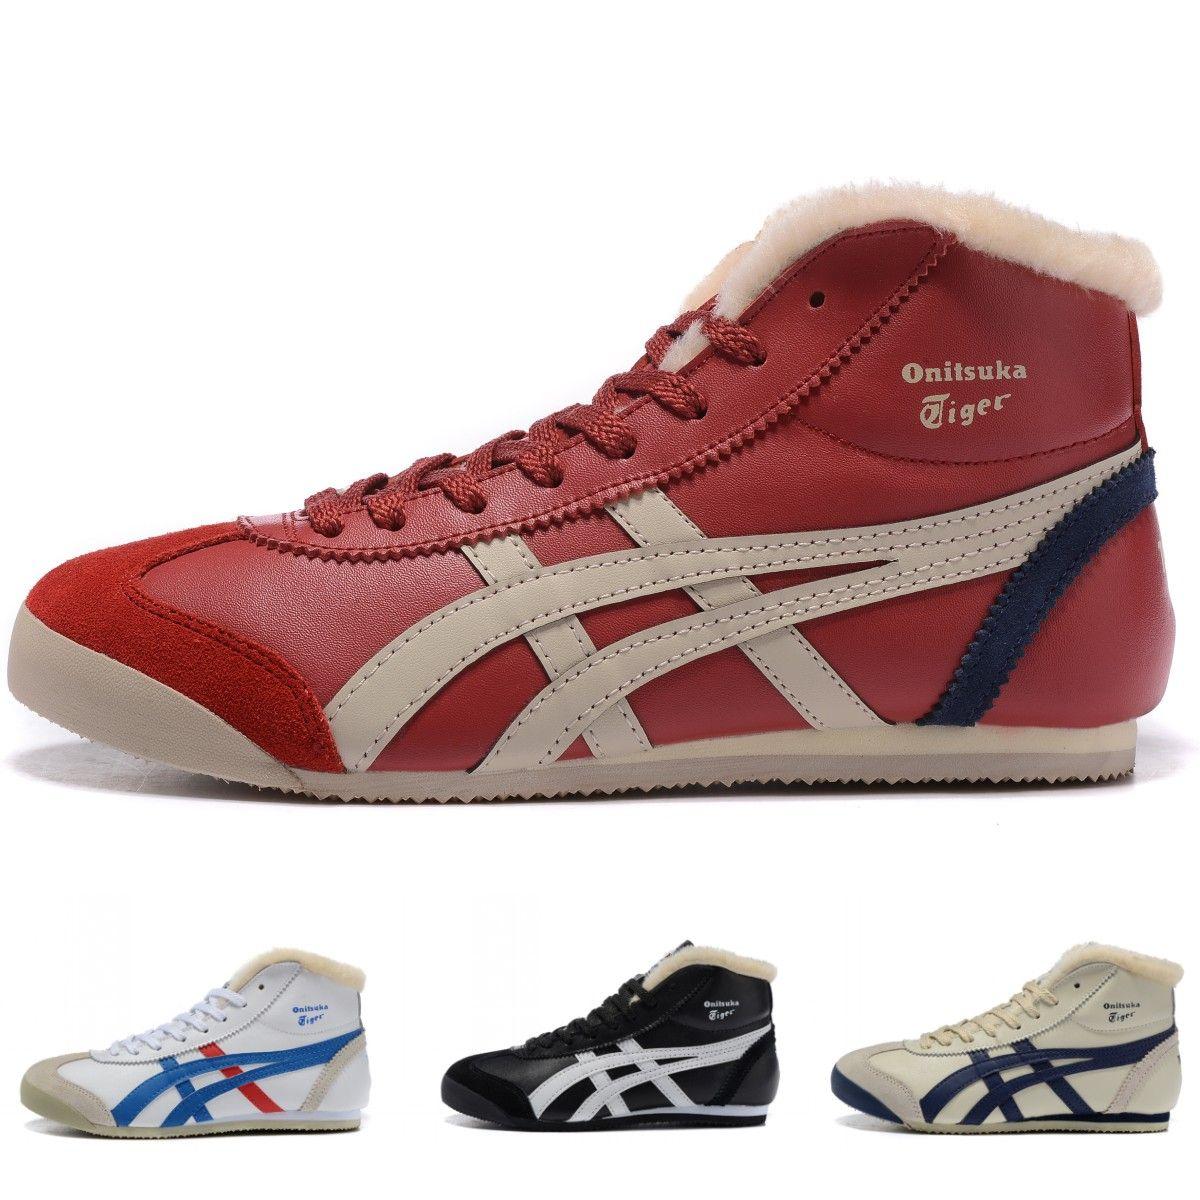 buy online d2087 eb6b9 Asics Onitsuka Tiger Designer Schuhe Mens Womens Hohe Wärme Athletic Schuhe  Asics Classic Professional Laufschuhe Größe 36-44